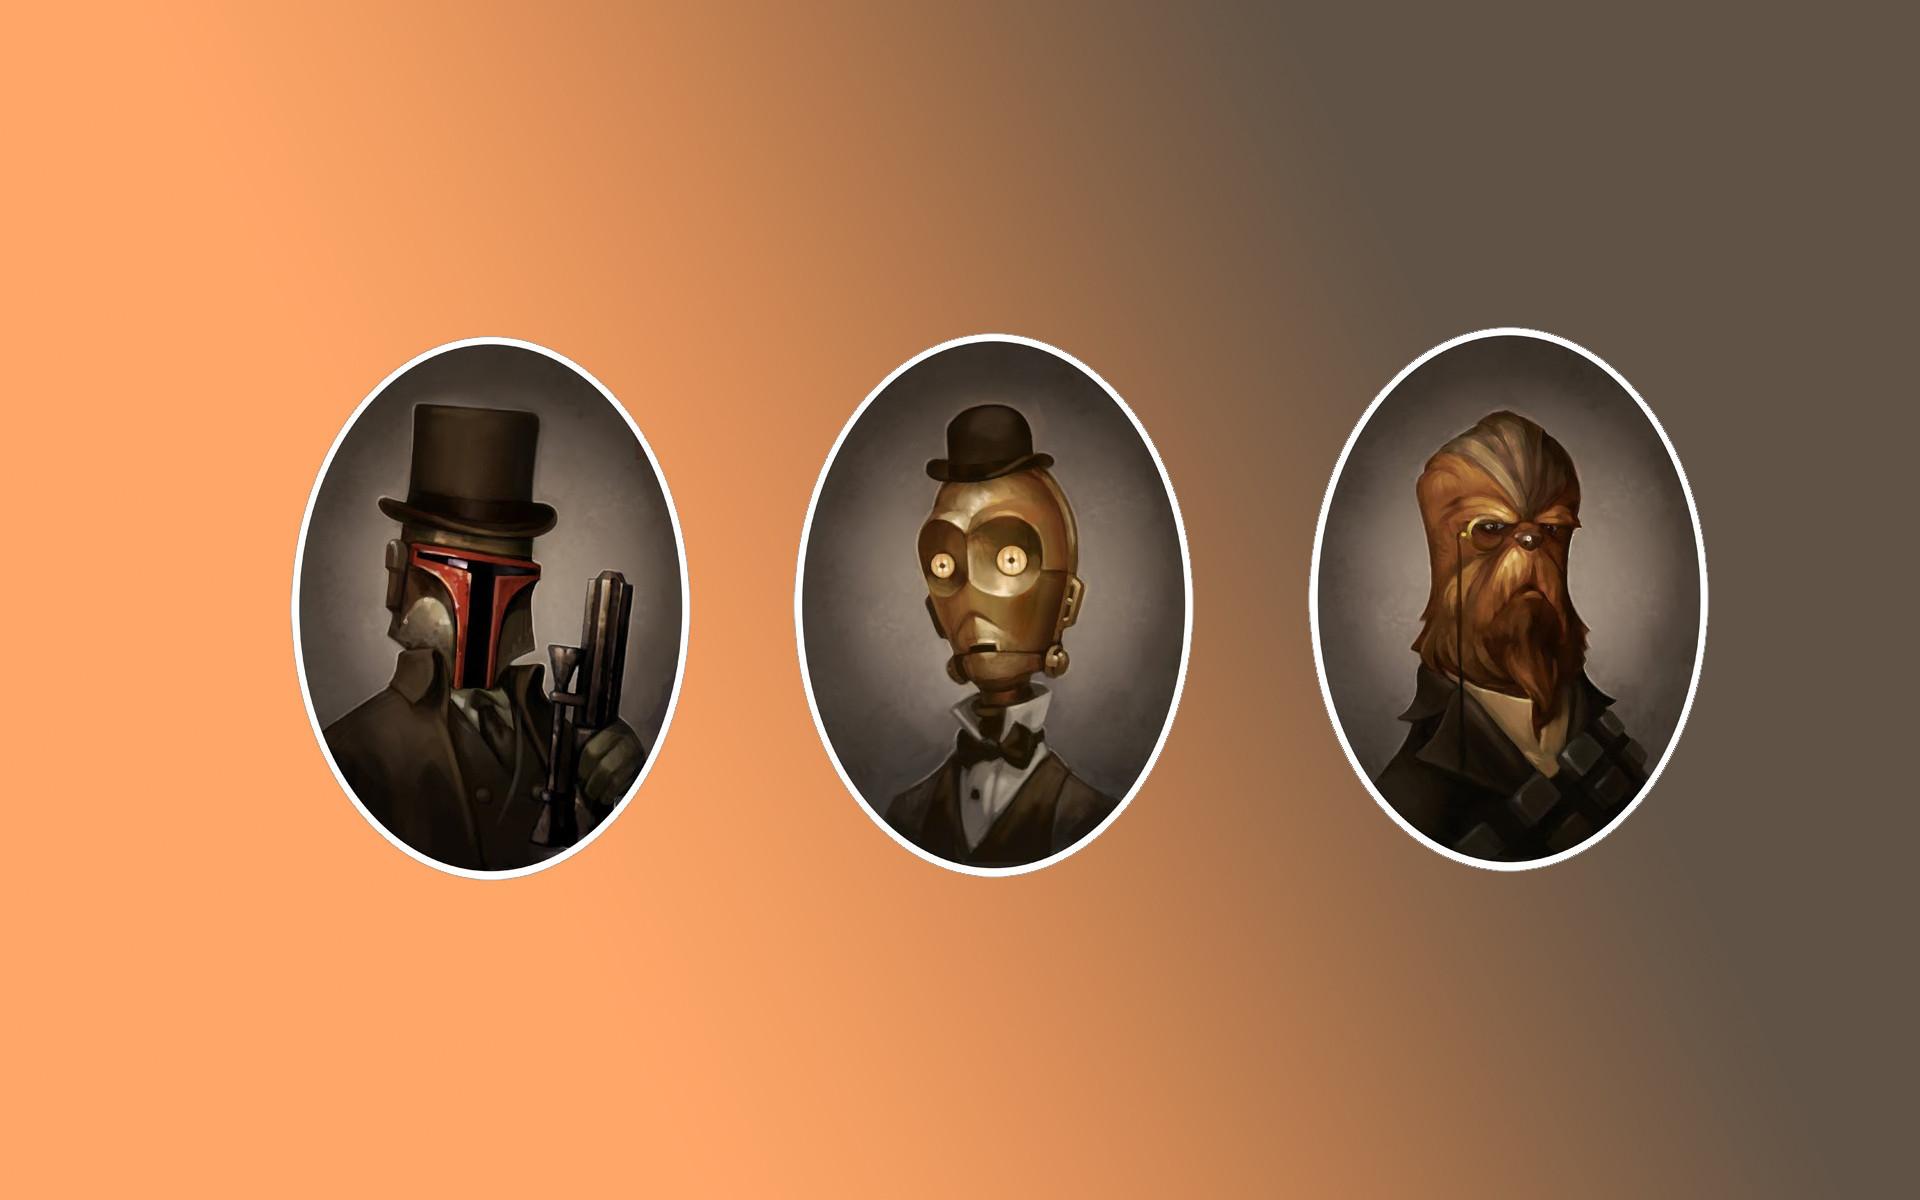 Steampunk Star Wars Boba Fett C-3PO Chewbacca wallpaper | | 62481  | WallpaperUP